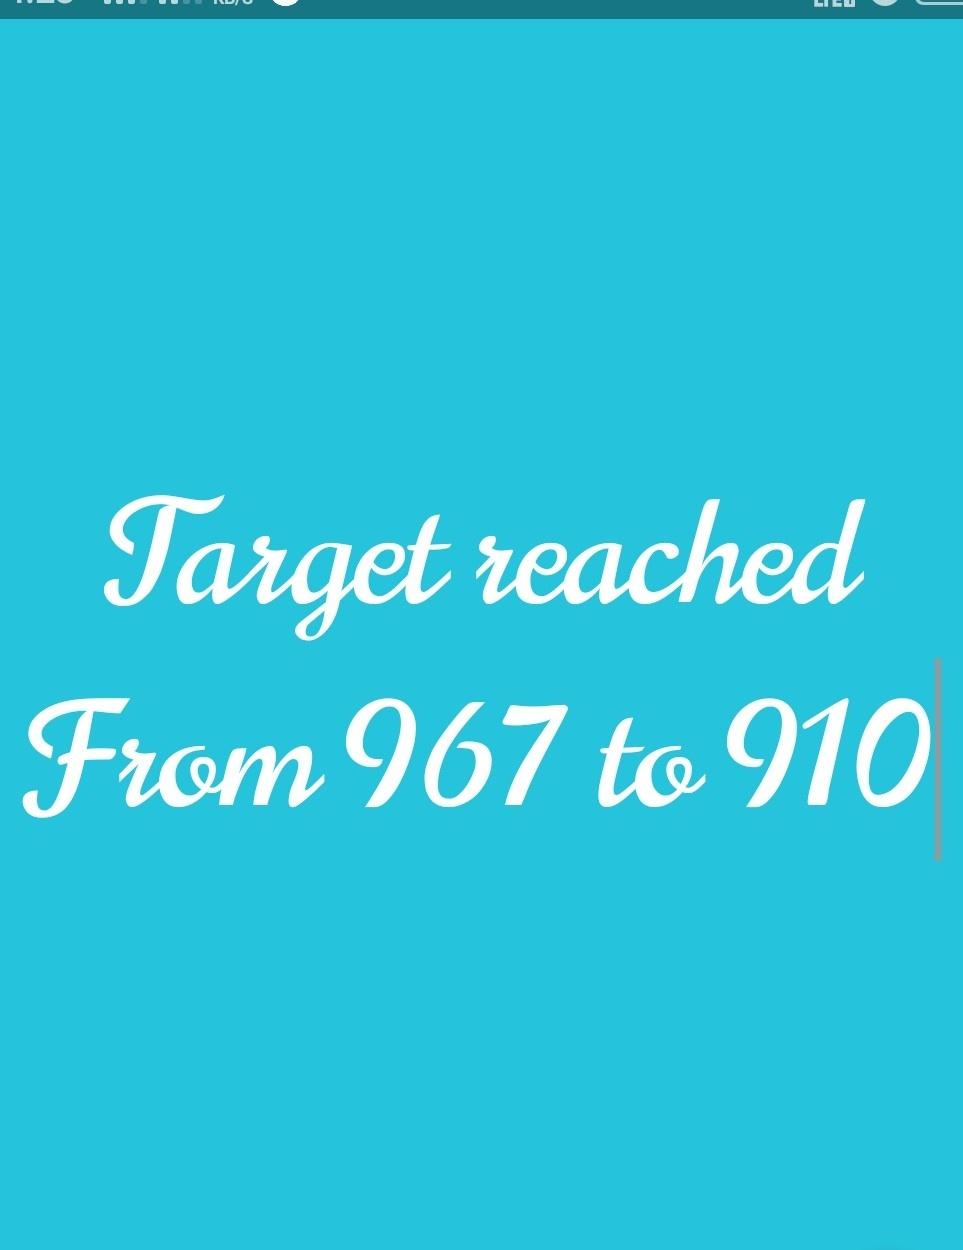 IRCTC - 436546